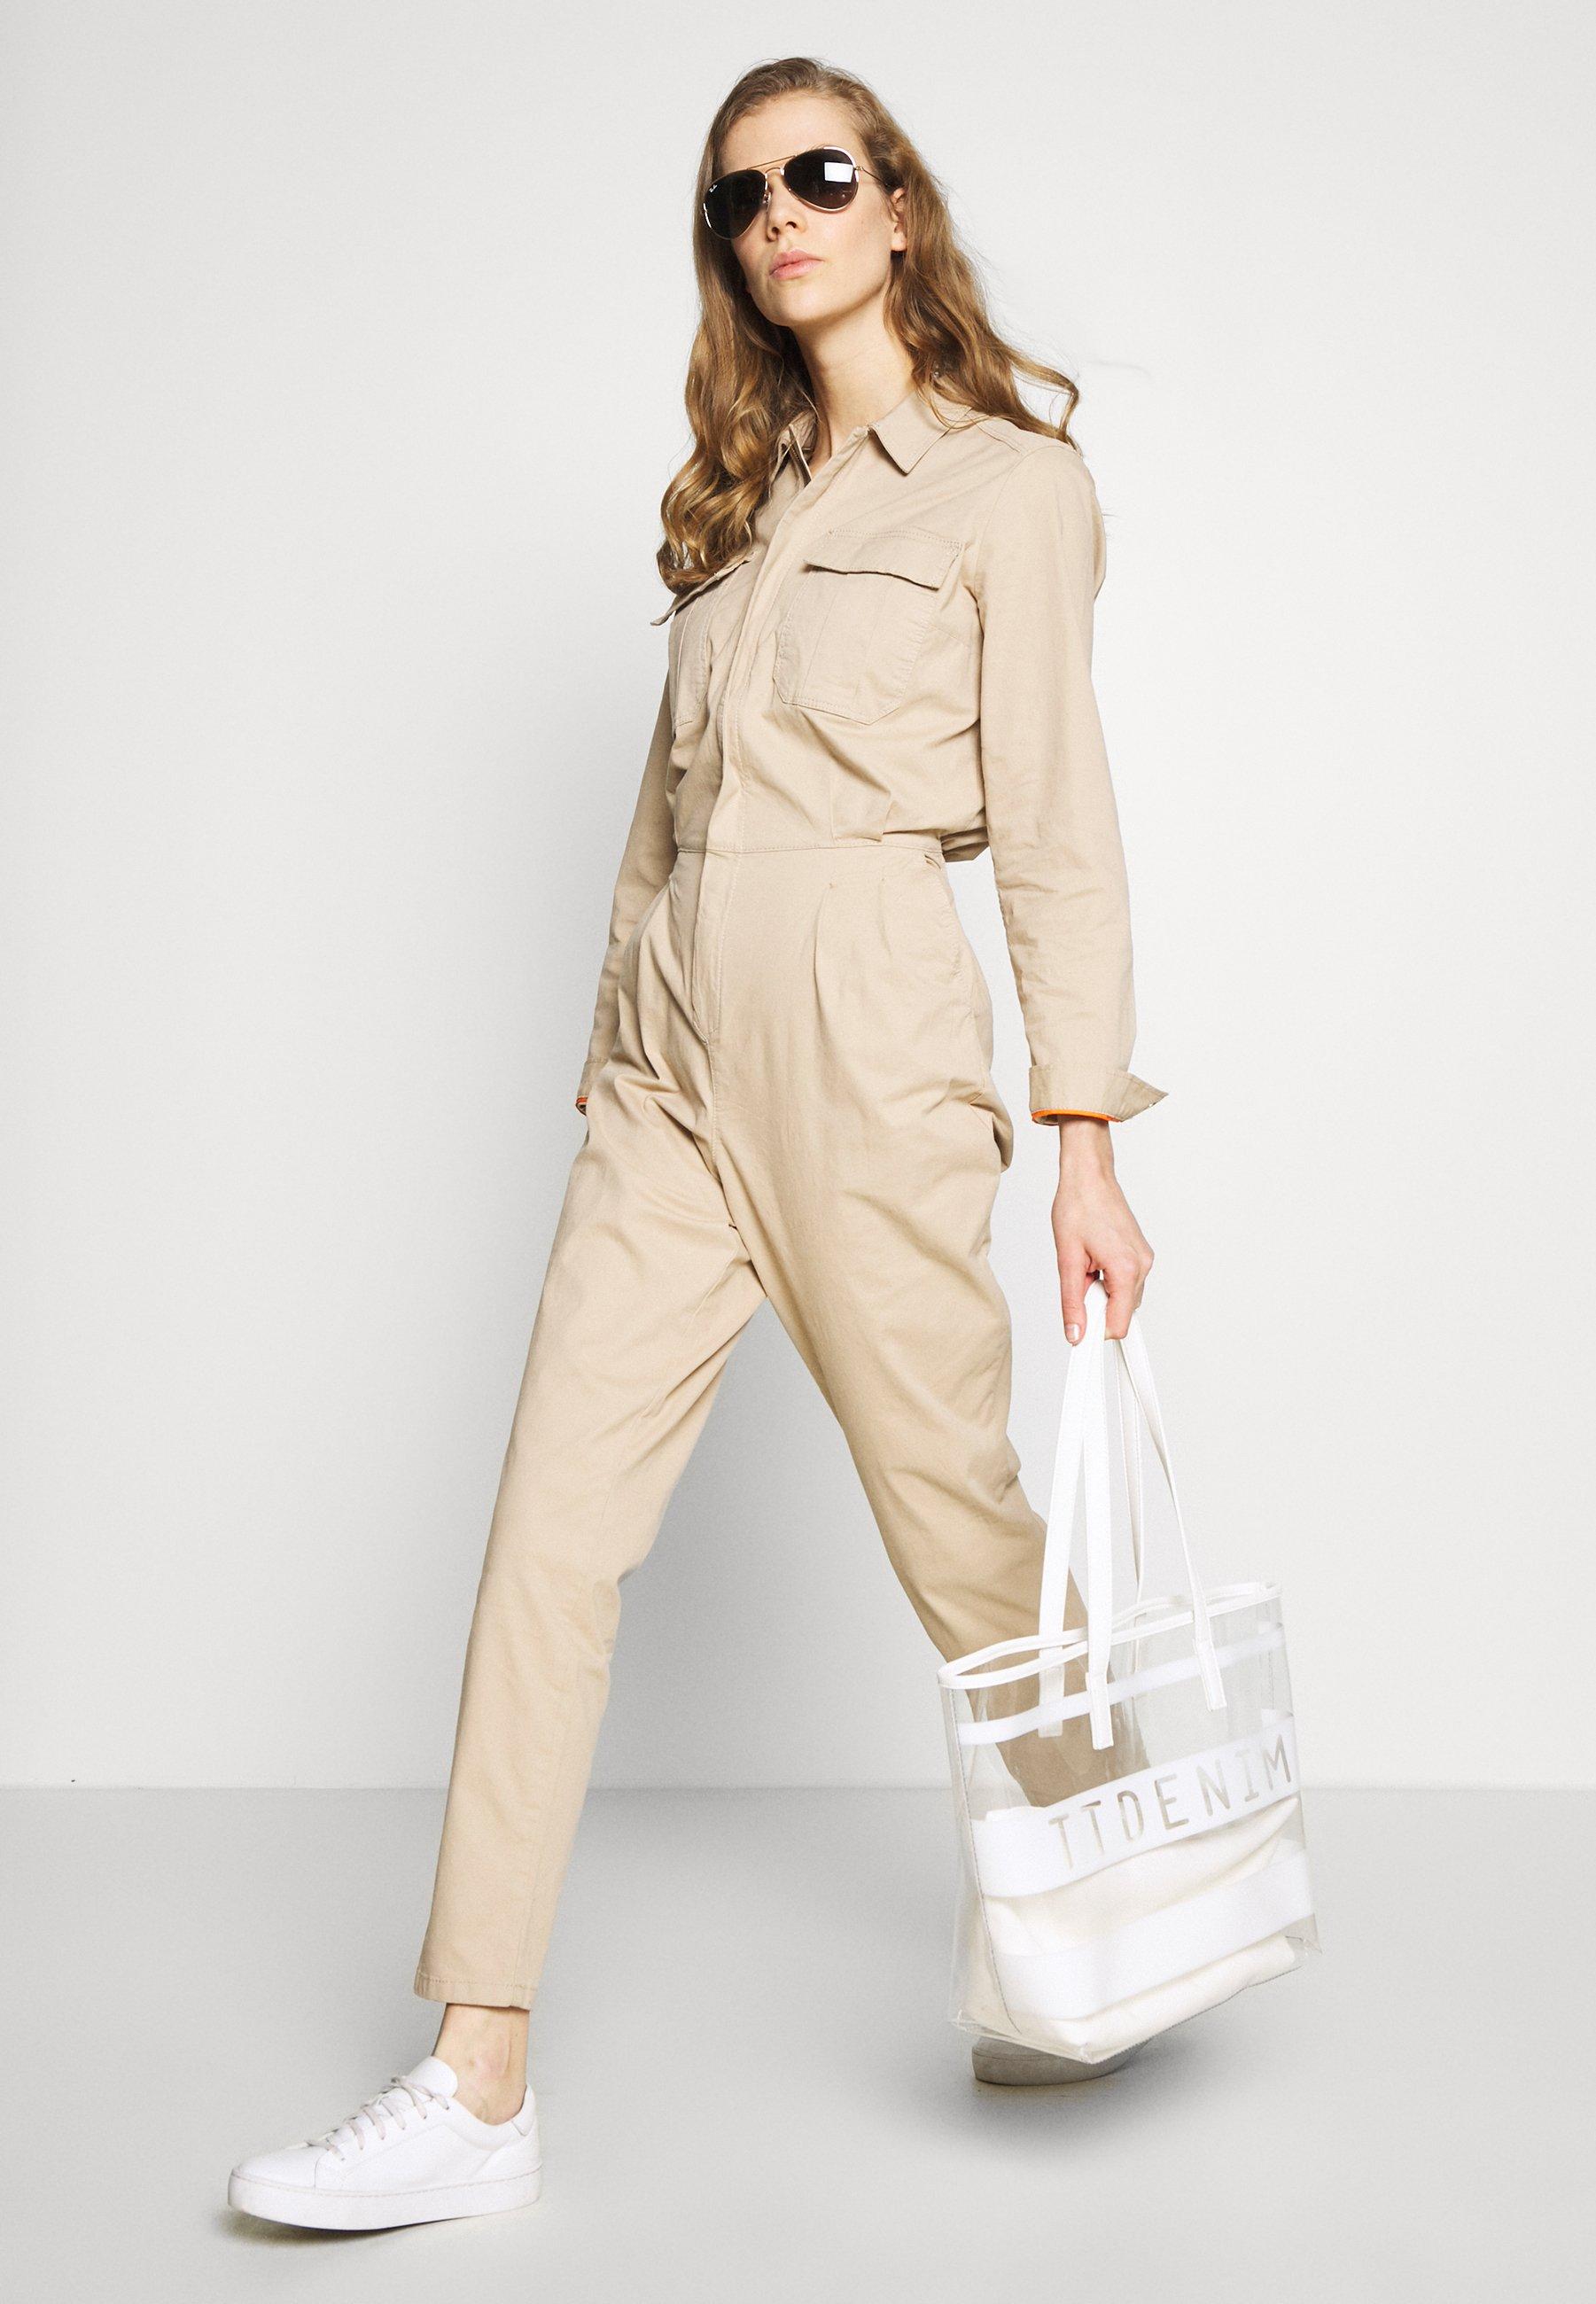 Tom Tailor Denim Linares Set - Shopping Bag White TMB8OzR